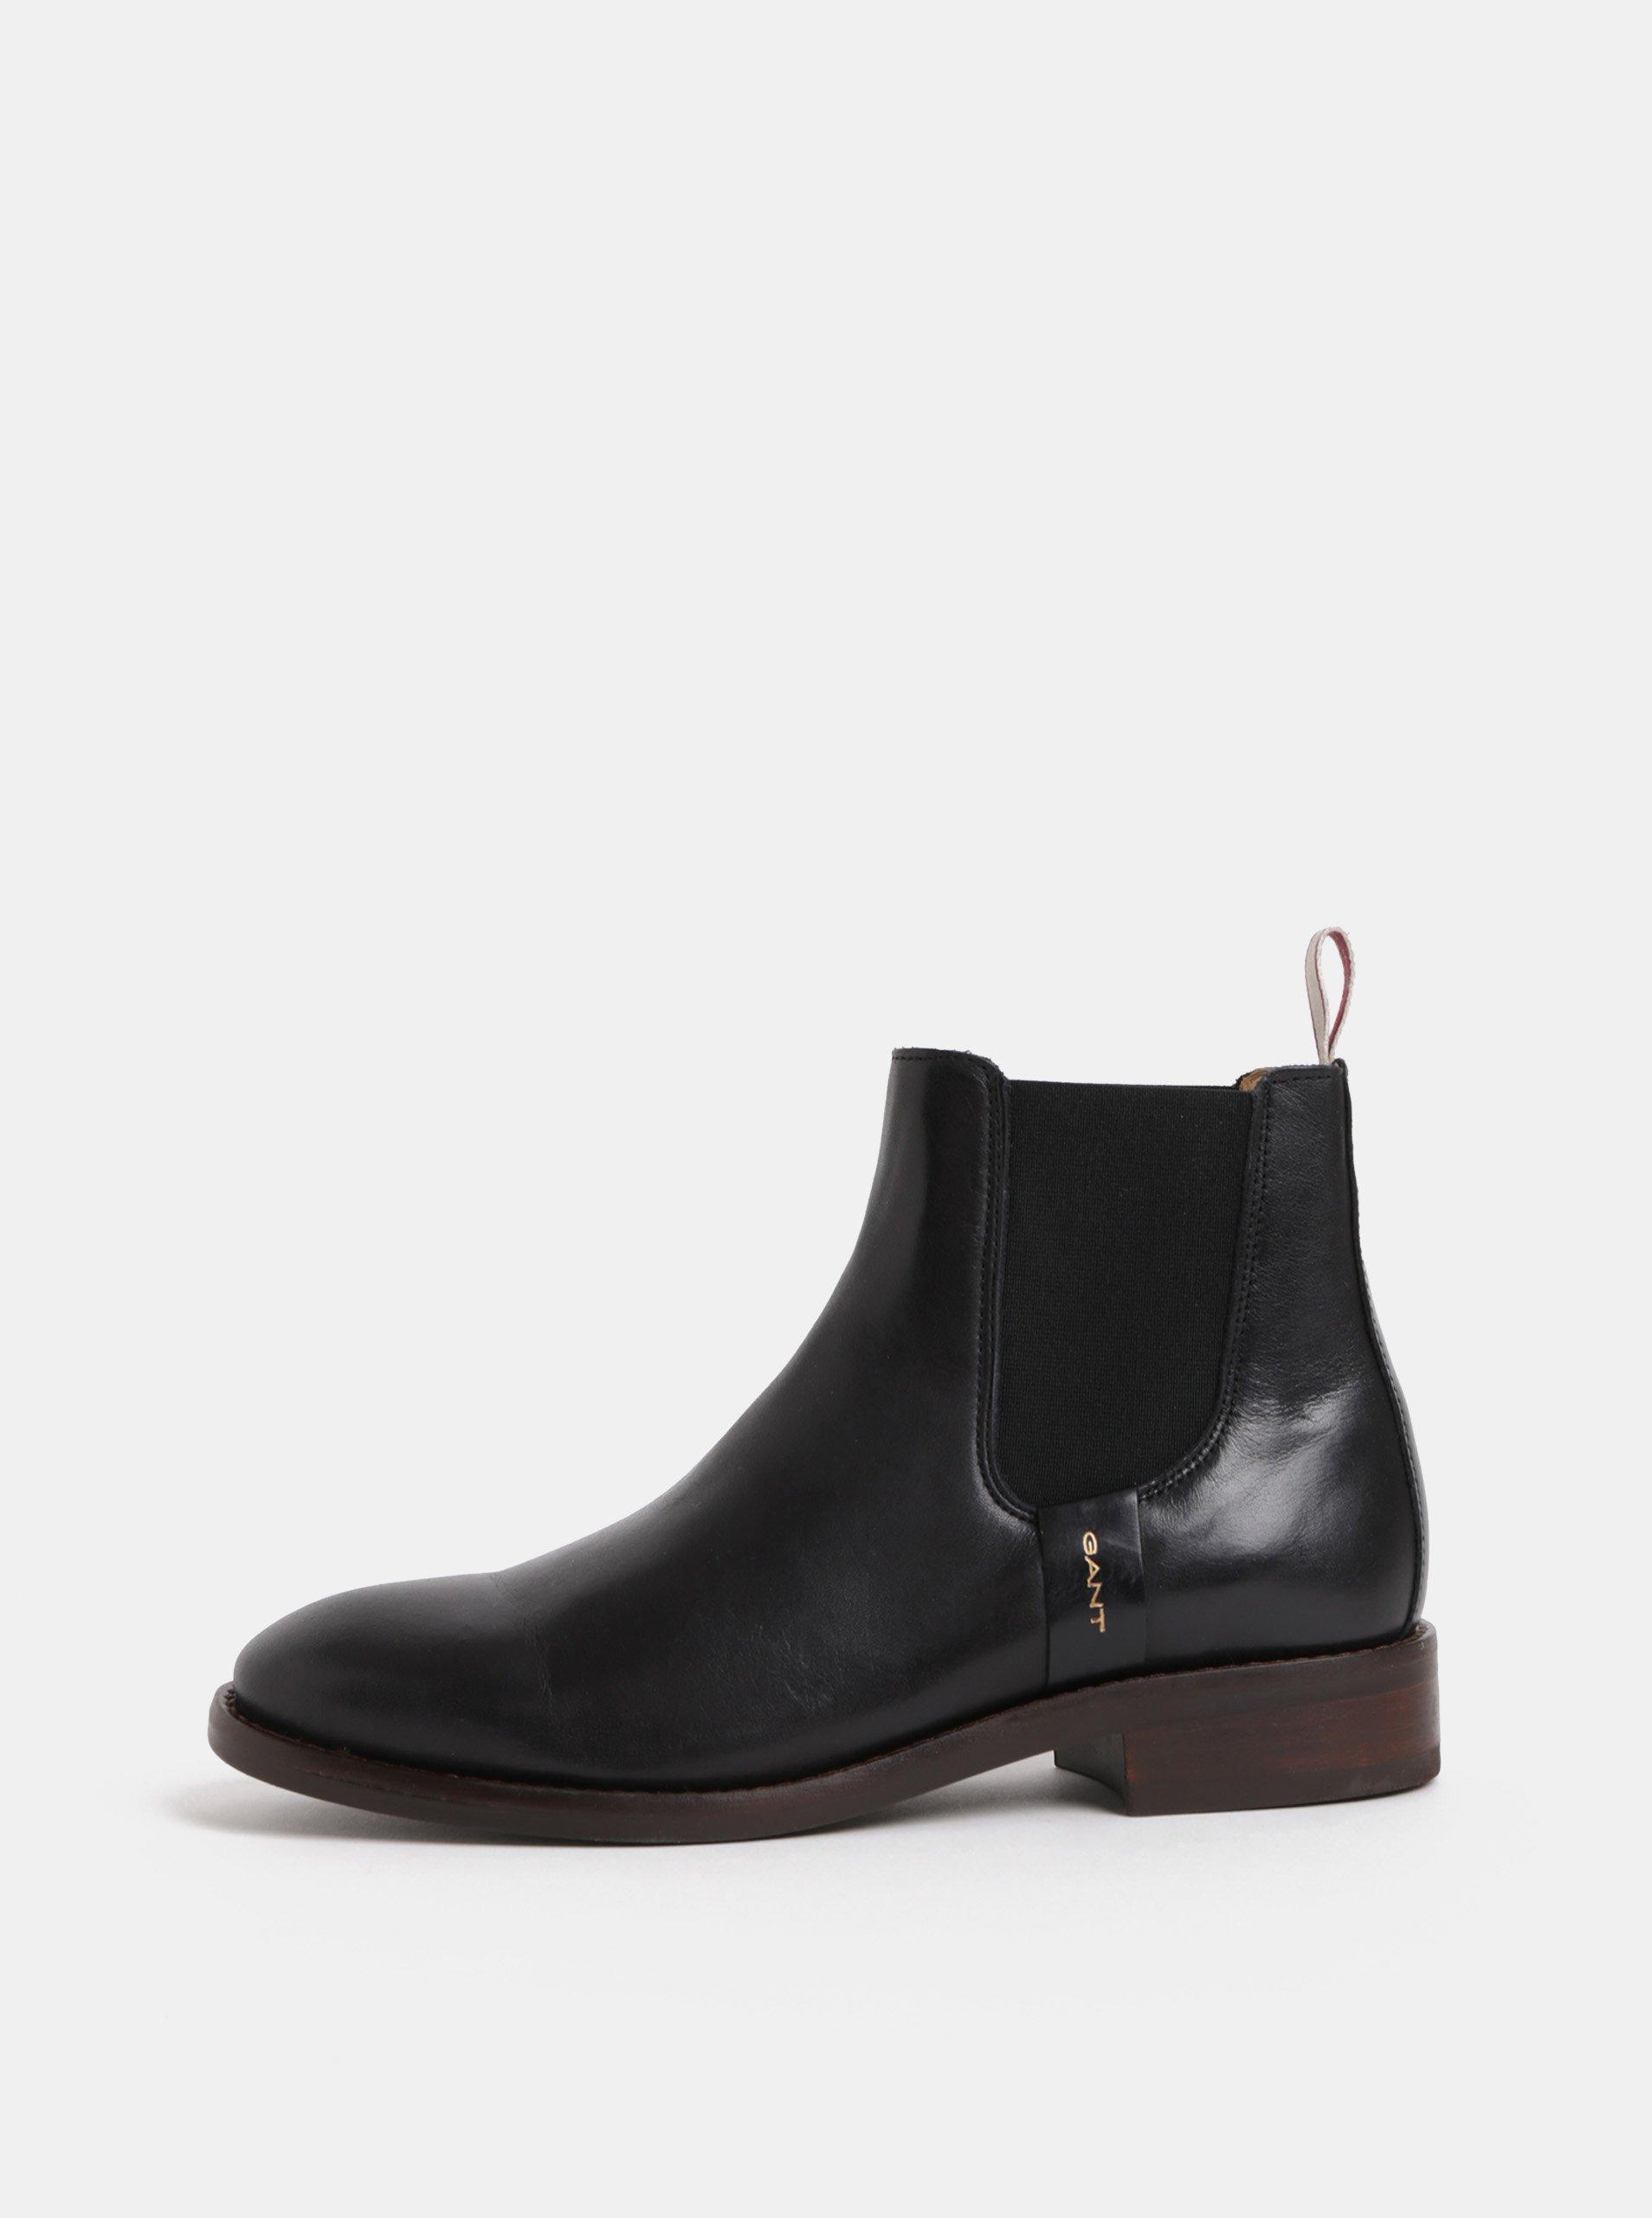 84a731bd6468 Čierne dámske kožené chelsea topánky GANT